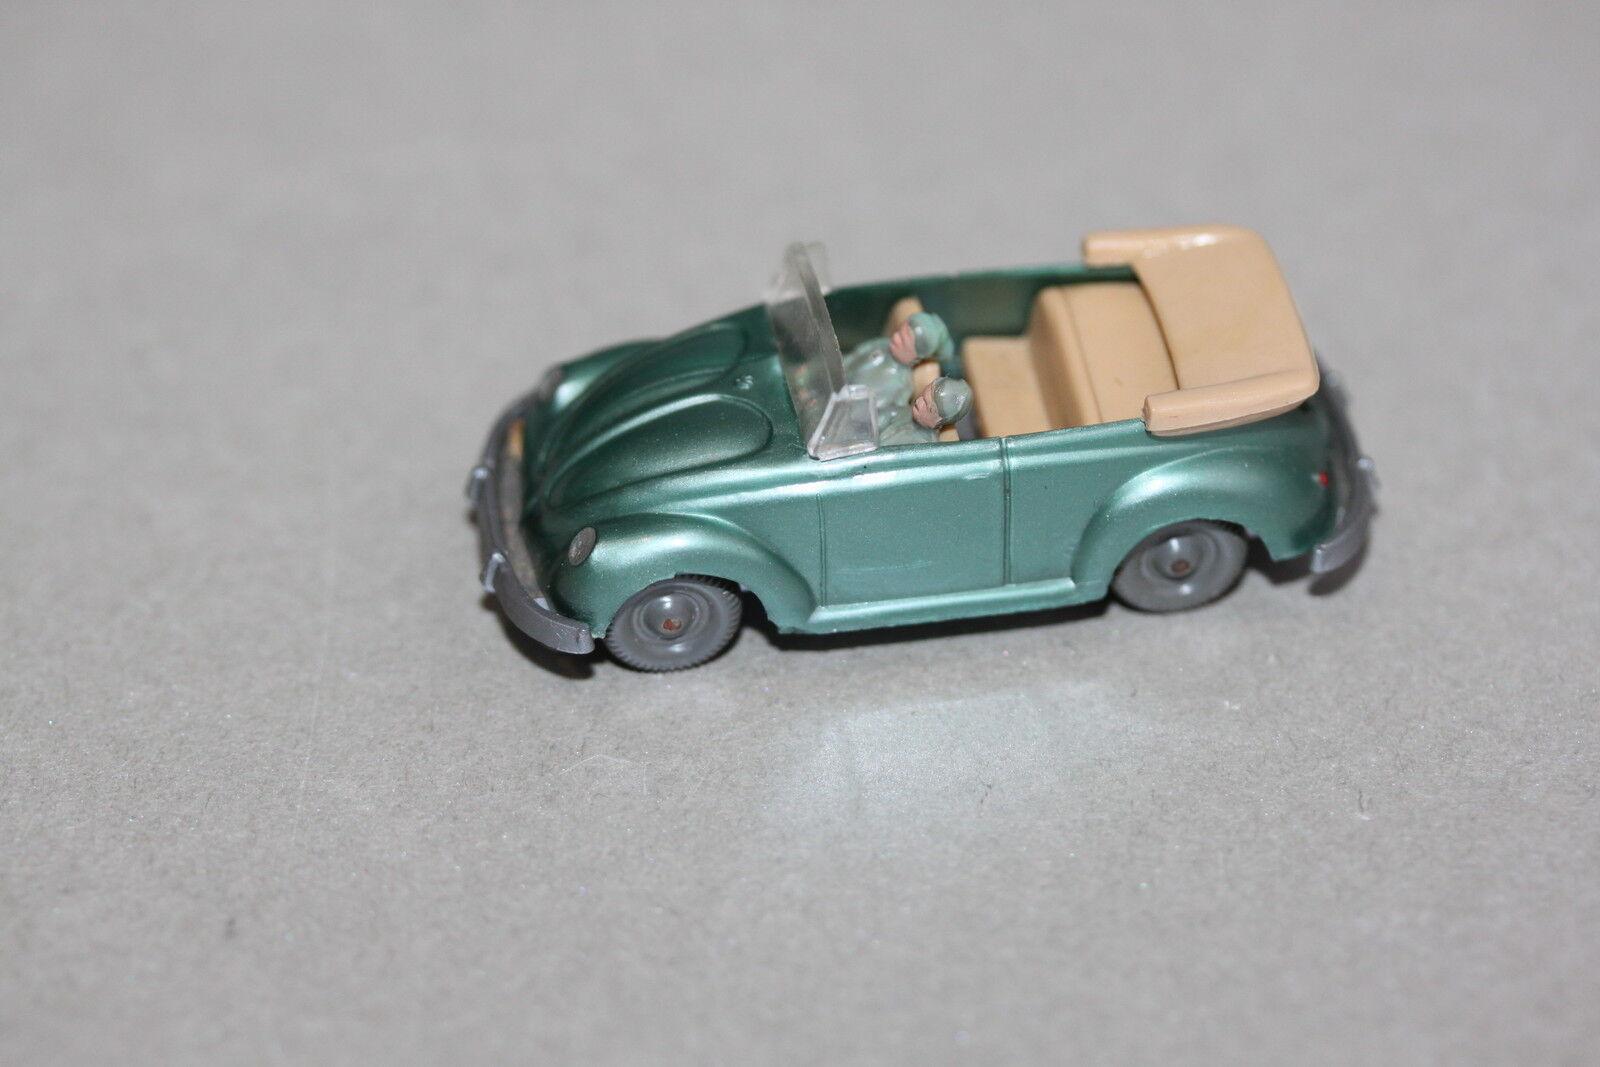 envio rapido a ti Wiking 33 3 vw esCocheabajo cabrio verde metalizado Spur h0 h0 h0  Web oficial